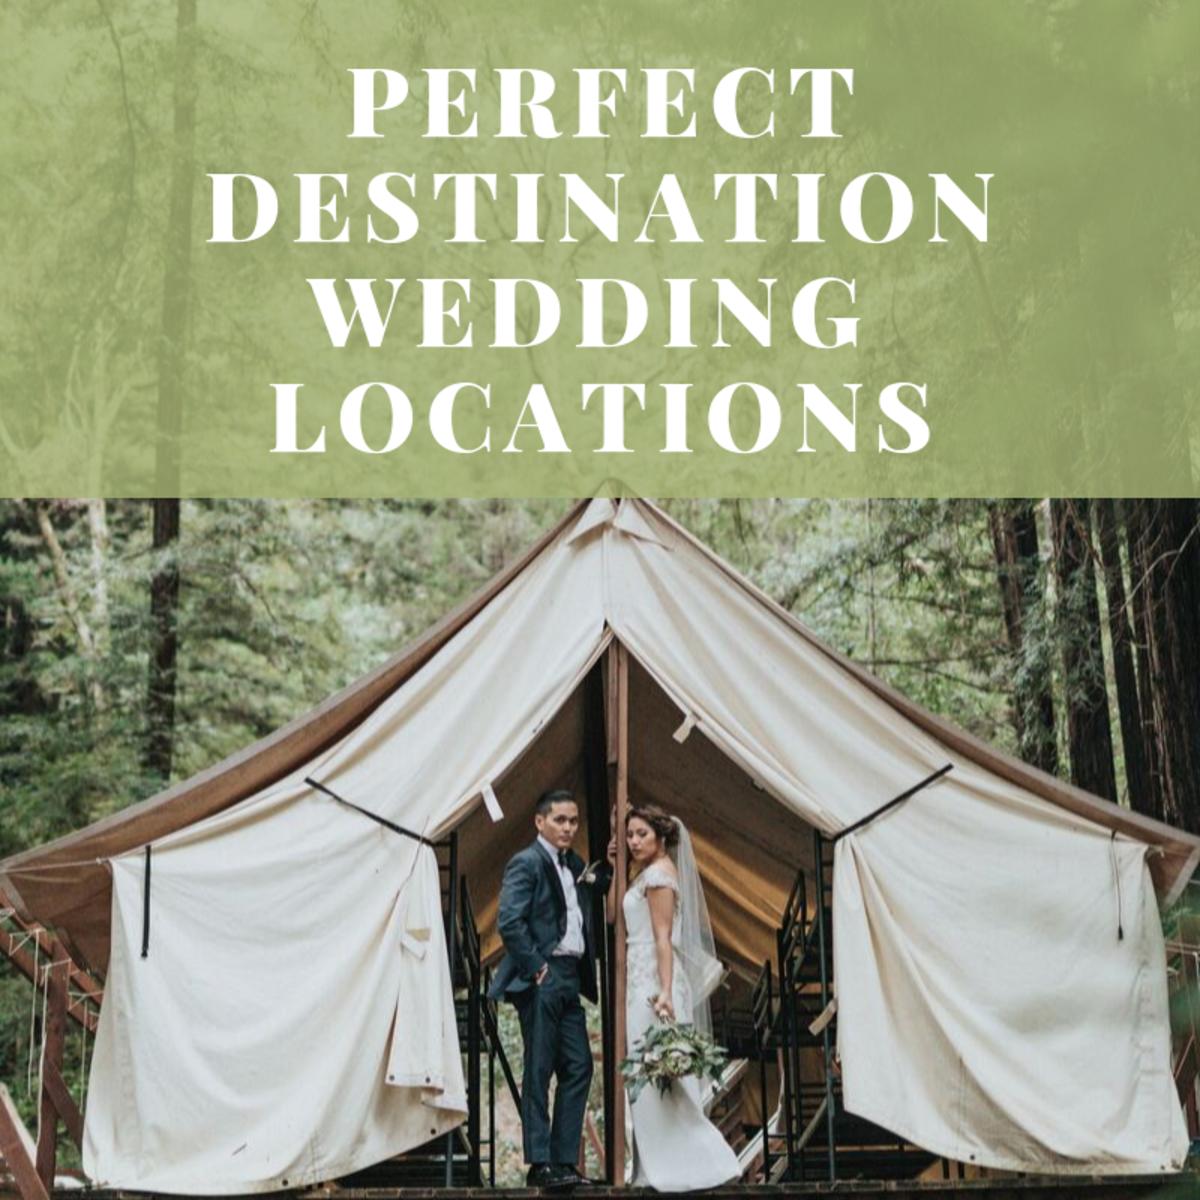 10 Perfect Destination Wedding Locations